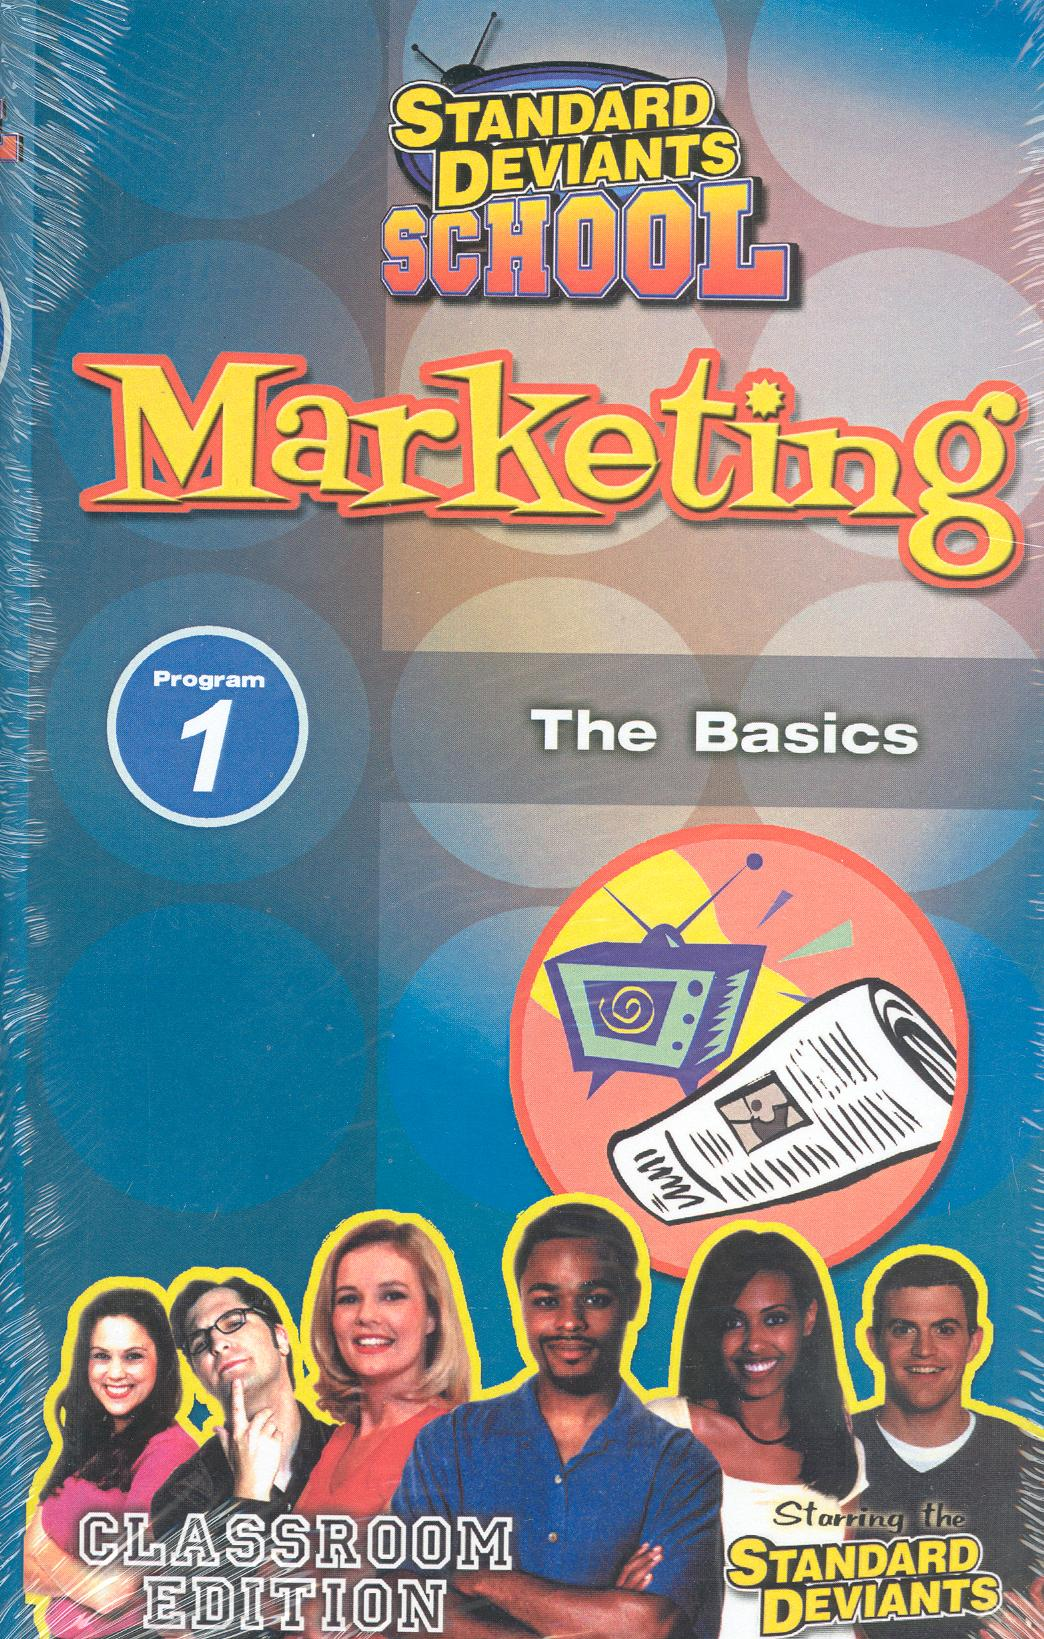 Standard Deviants School: Marketing, Program 1 - The Basics